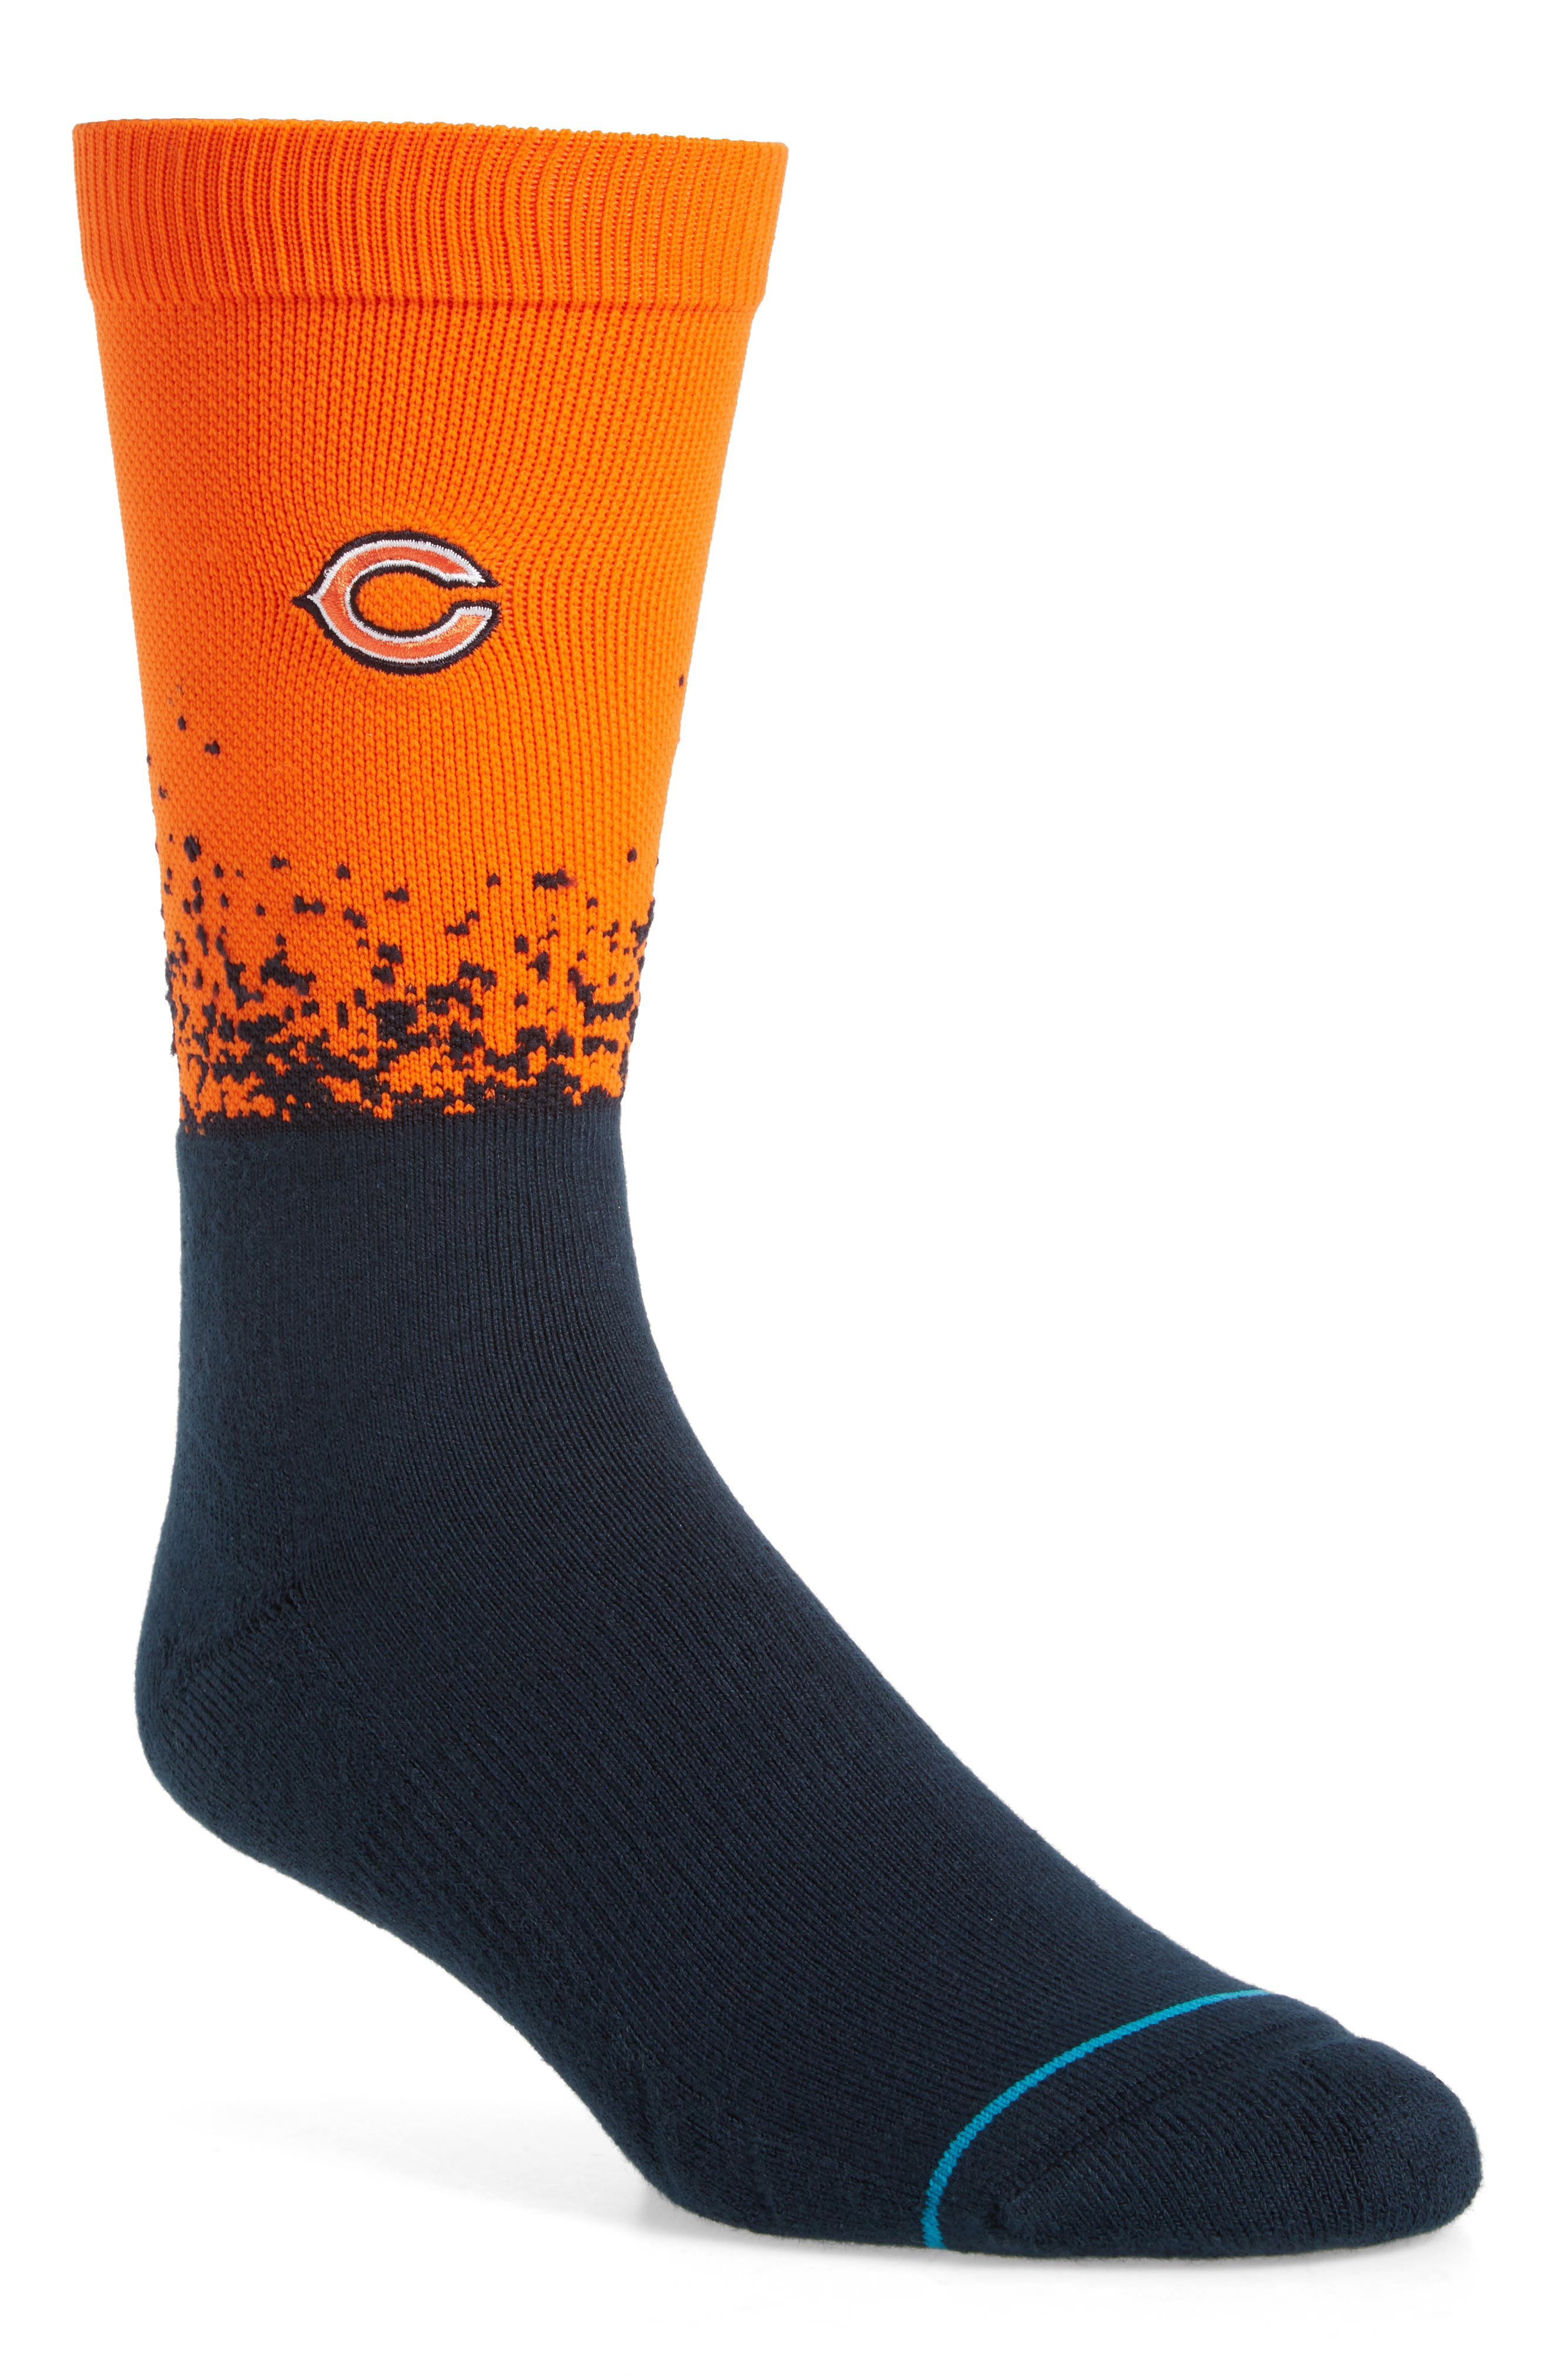 Chicago Bears - Fade Socks,                         Main,                         color, Orange